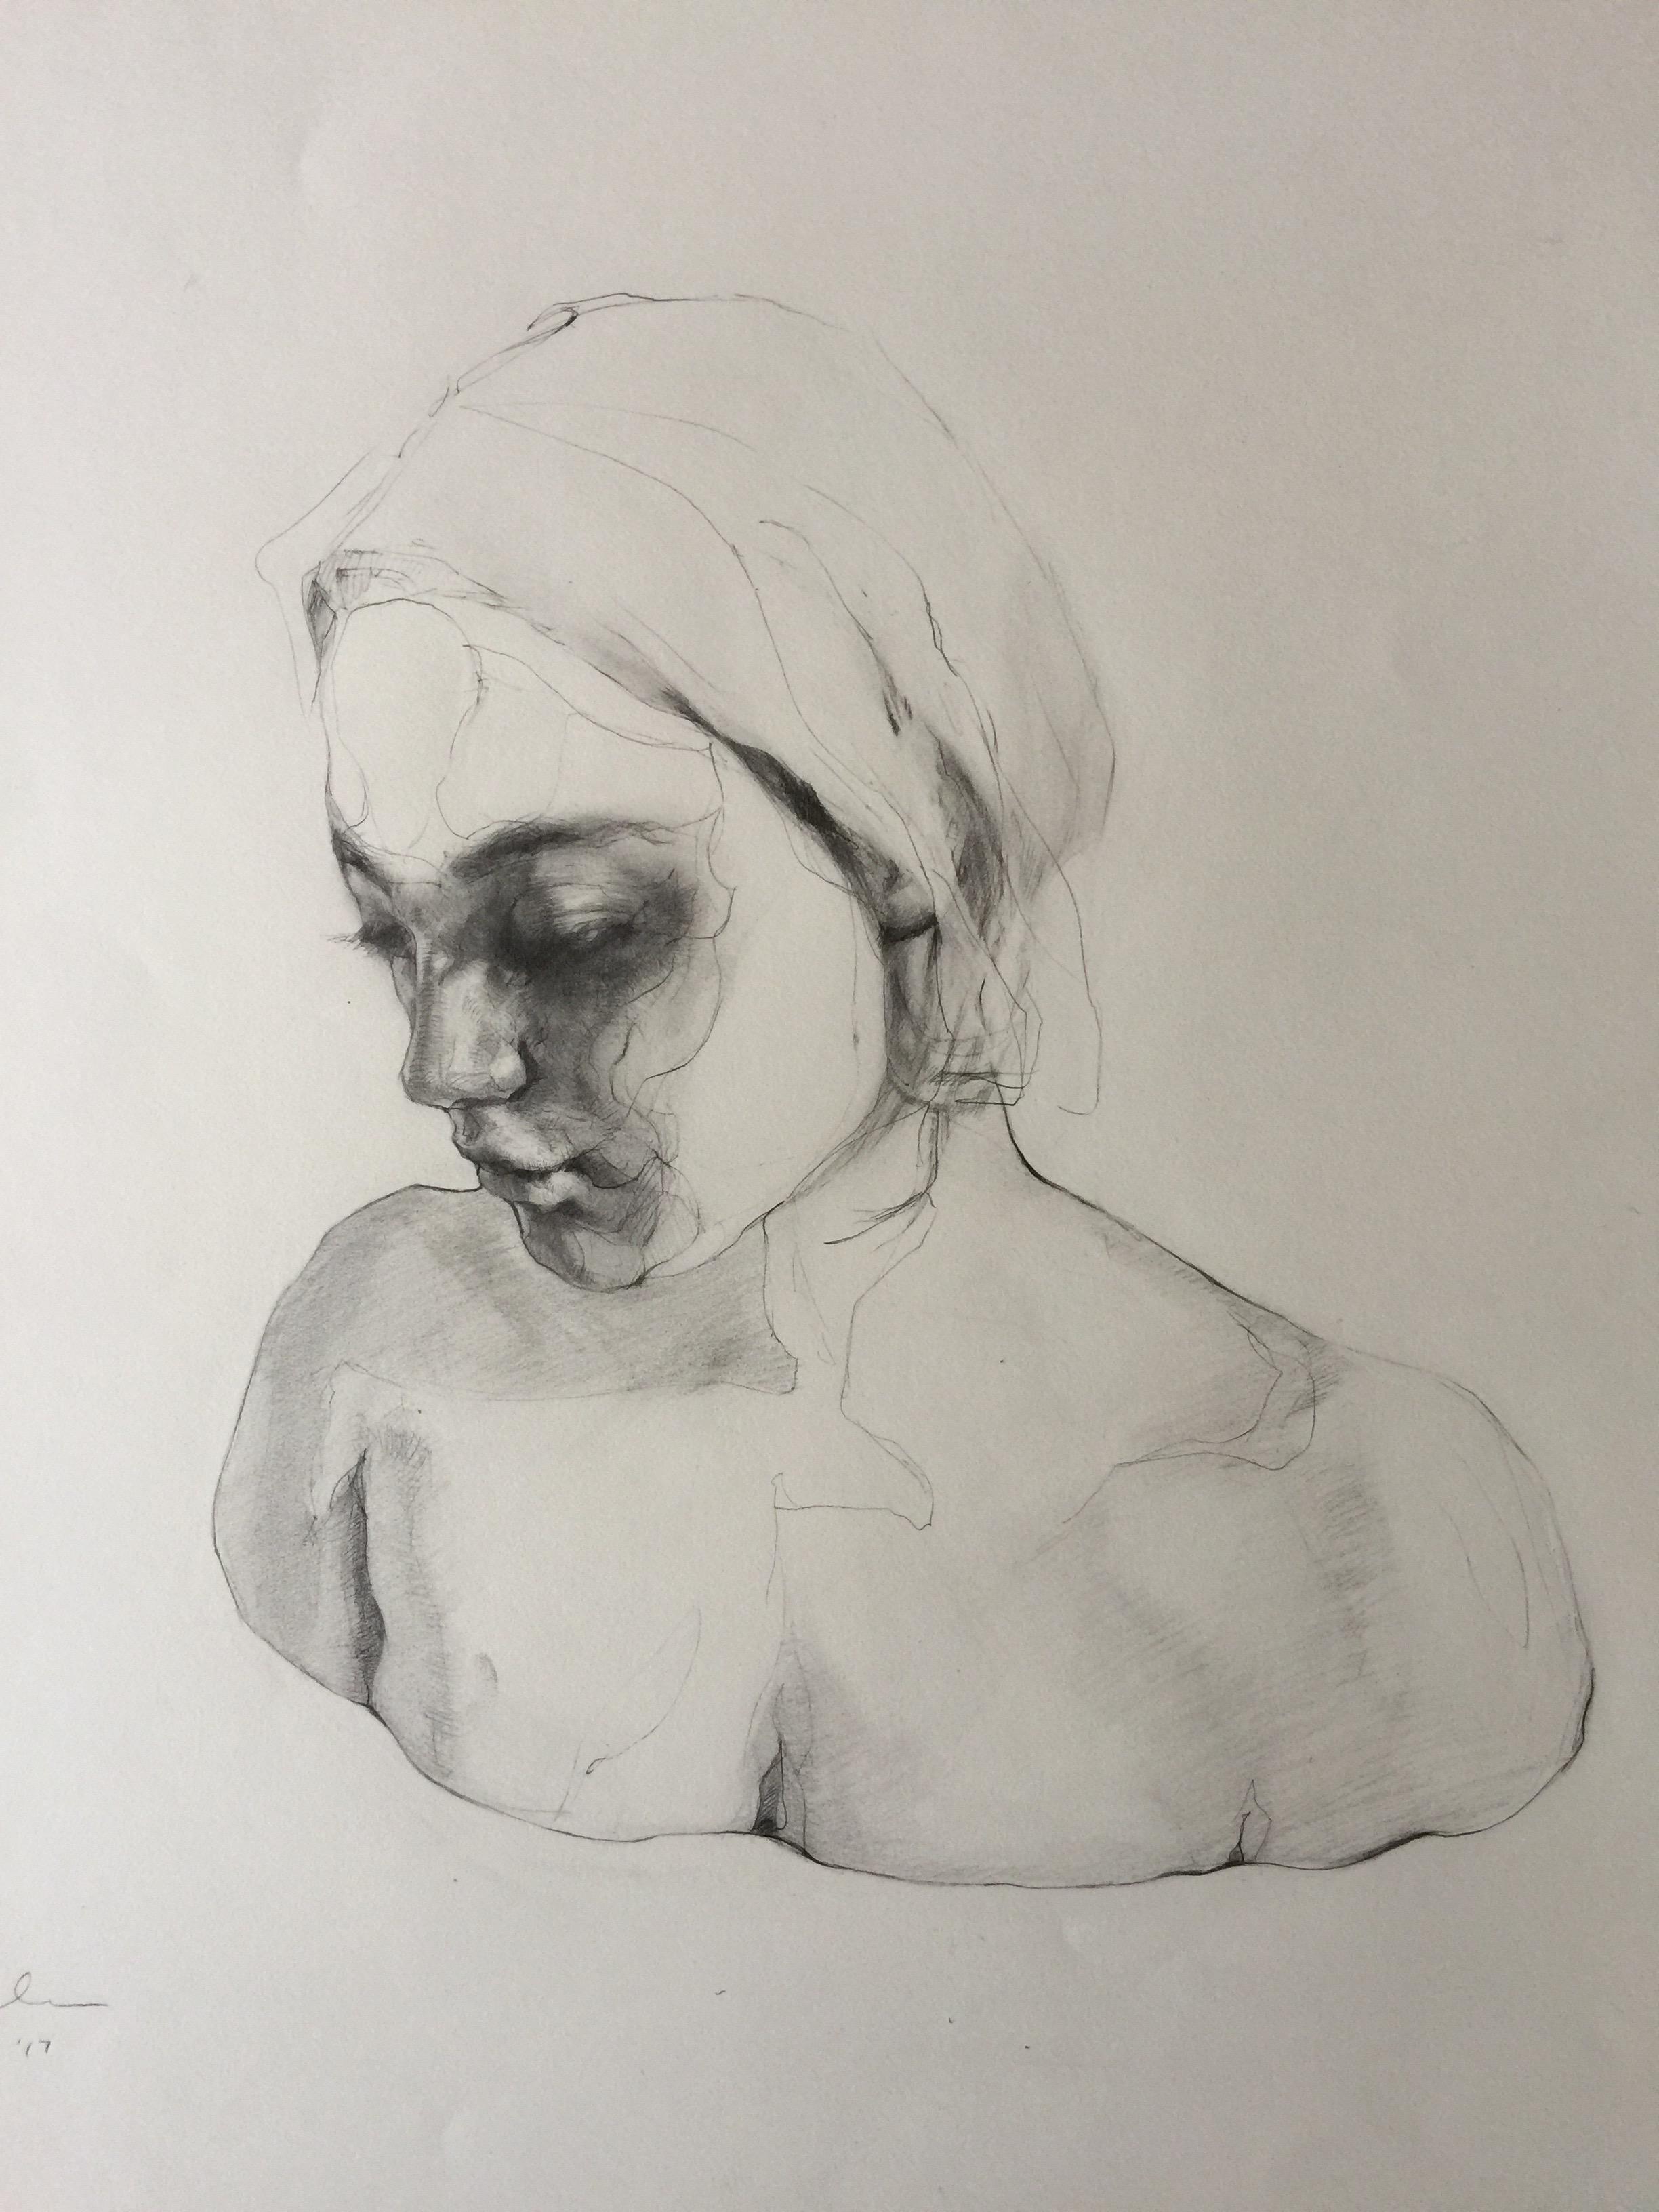 Agnes_Grochulska_Synthesis_Art_Process:Bust_3_pencil_18x24.JPG